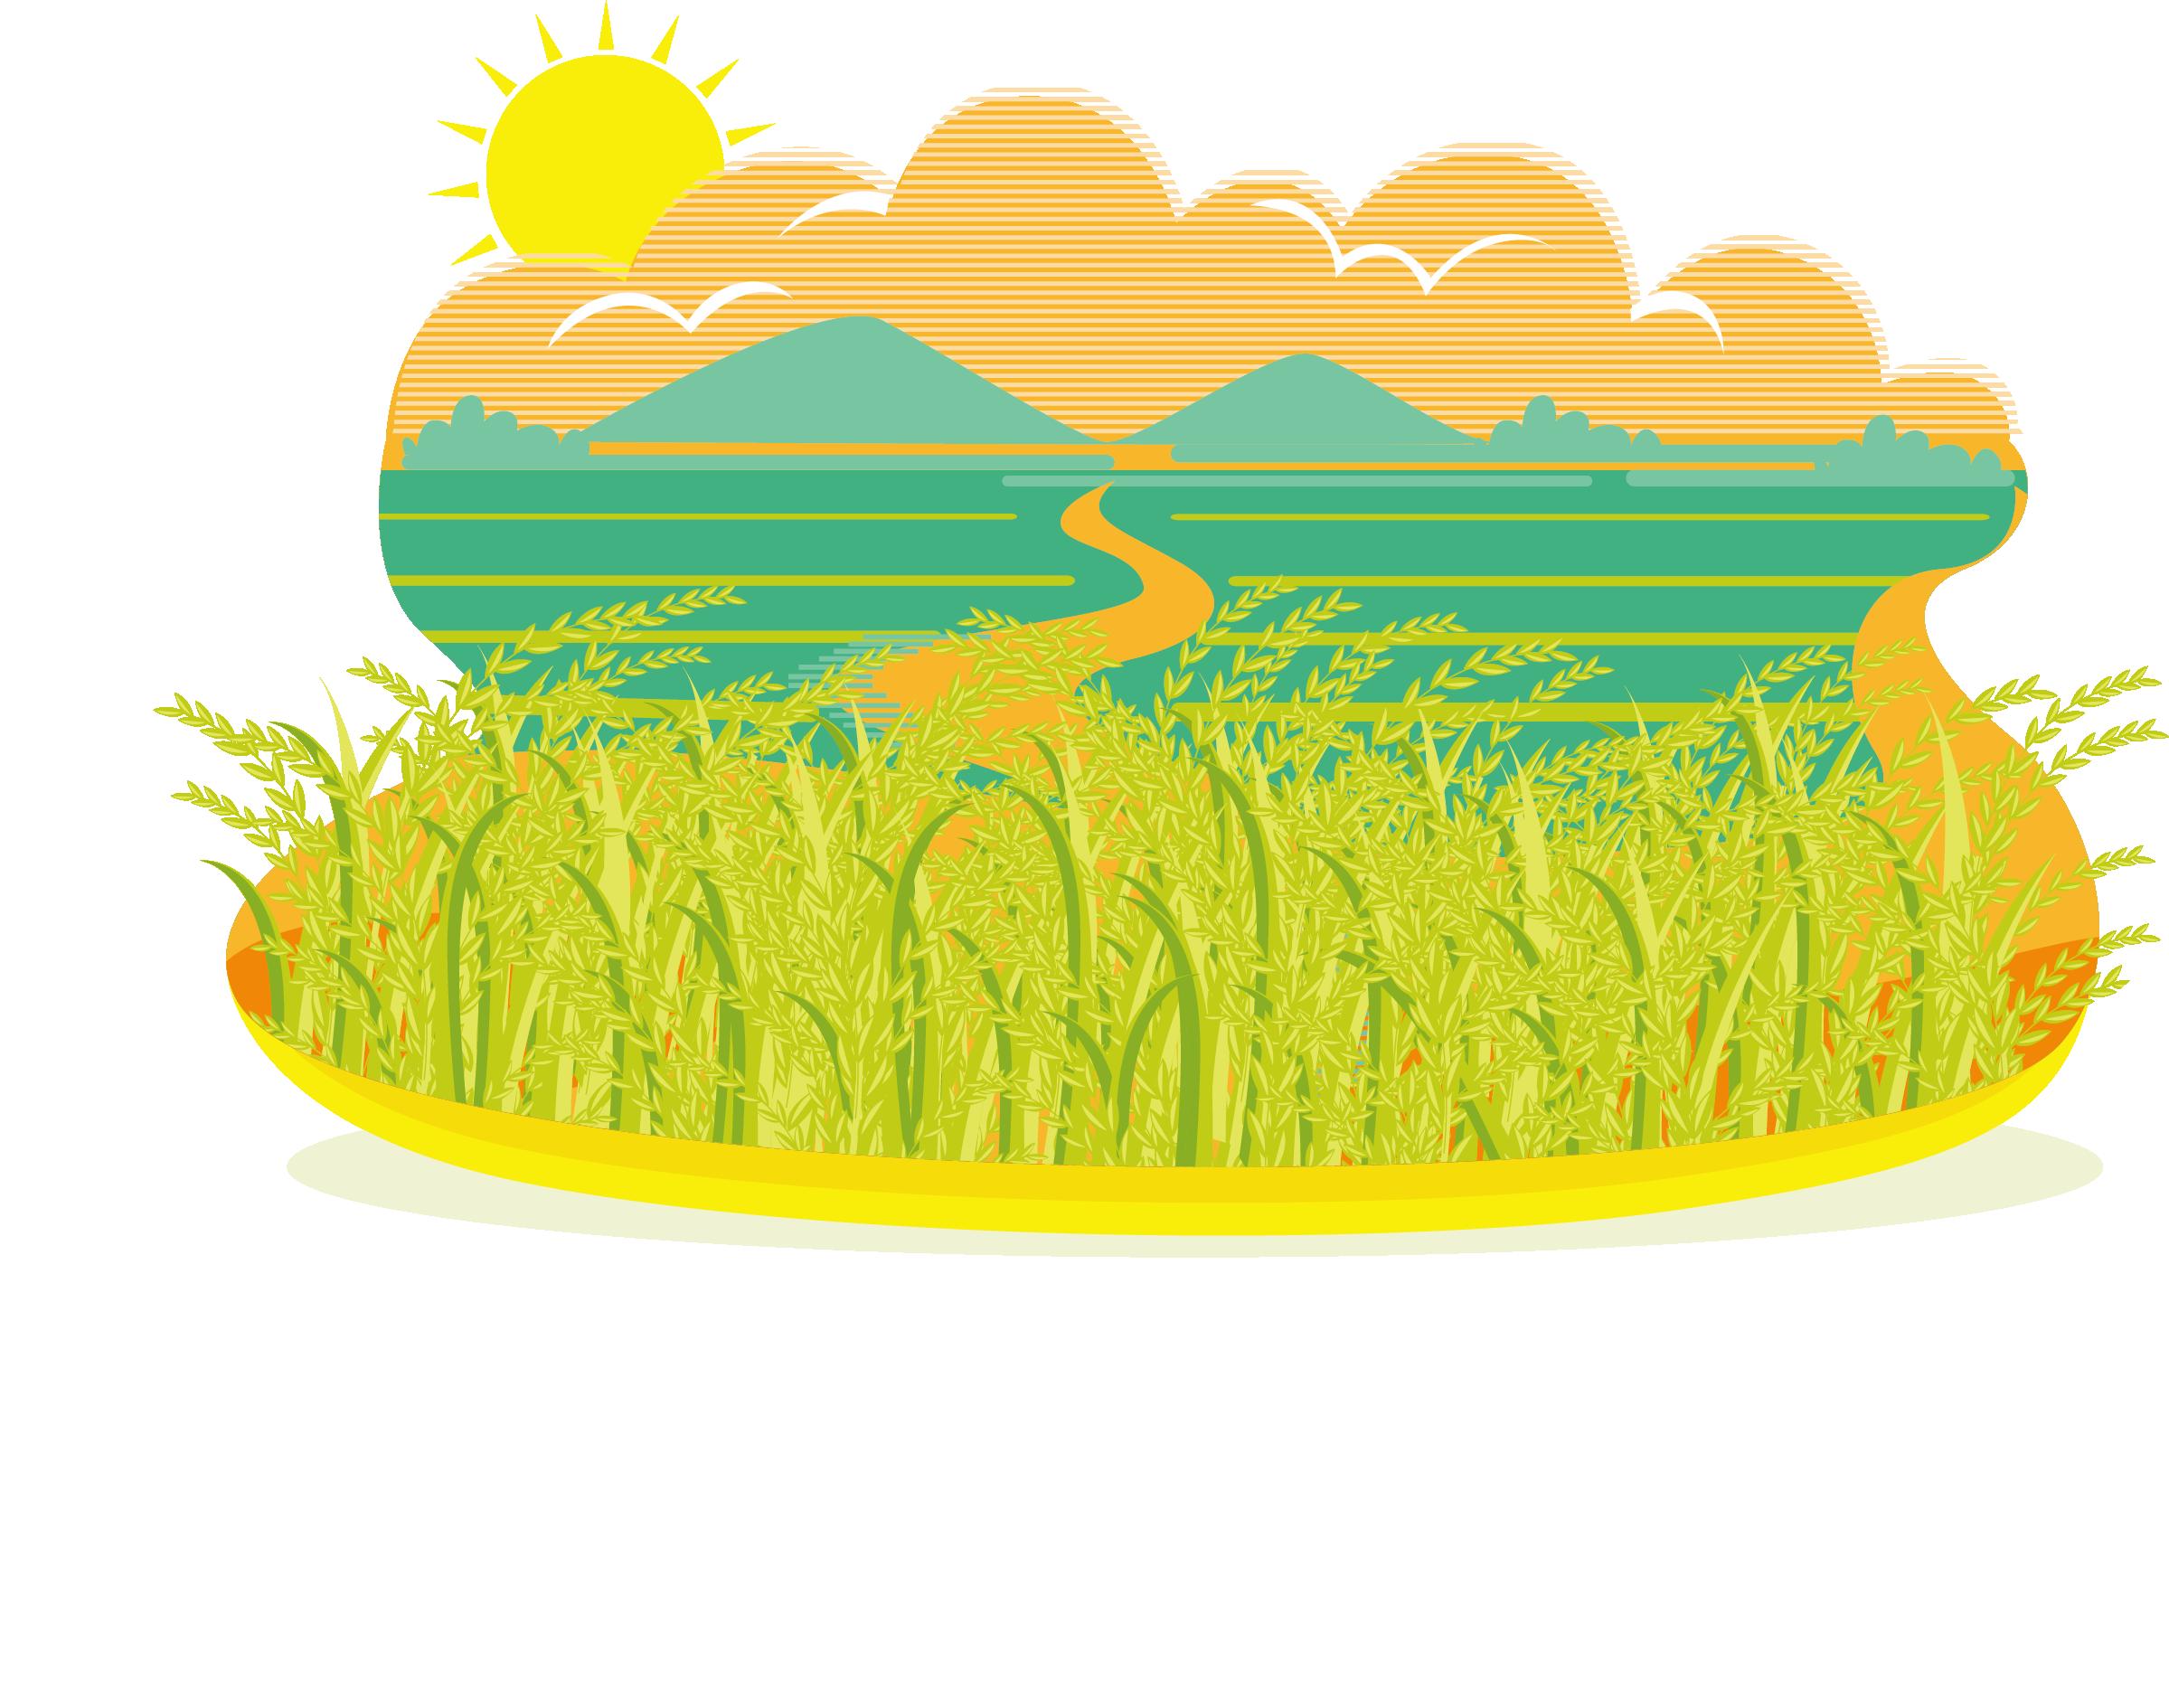 Clipart apple field jpg freeuse Paddy Field Rice Oryza sativa Clip art - Autumn rice fields ... jpg freeuse